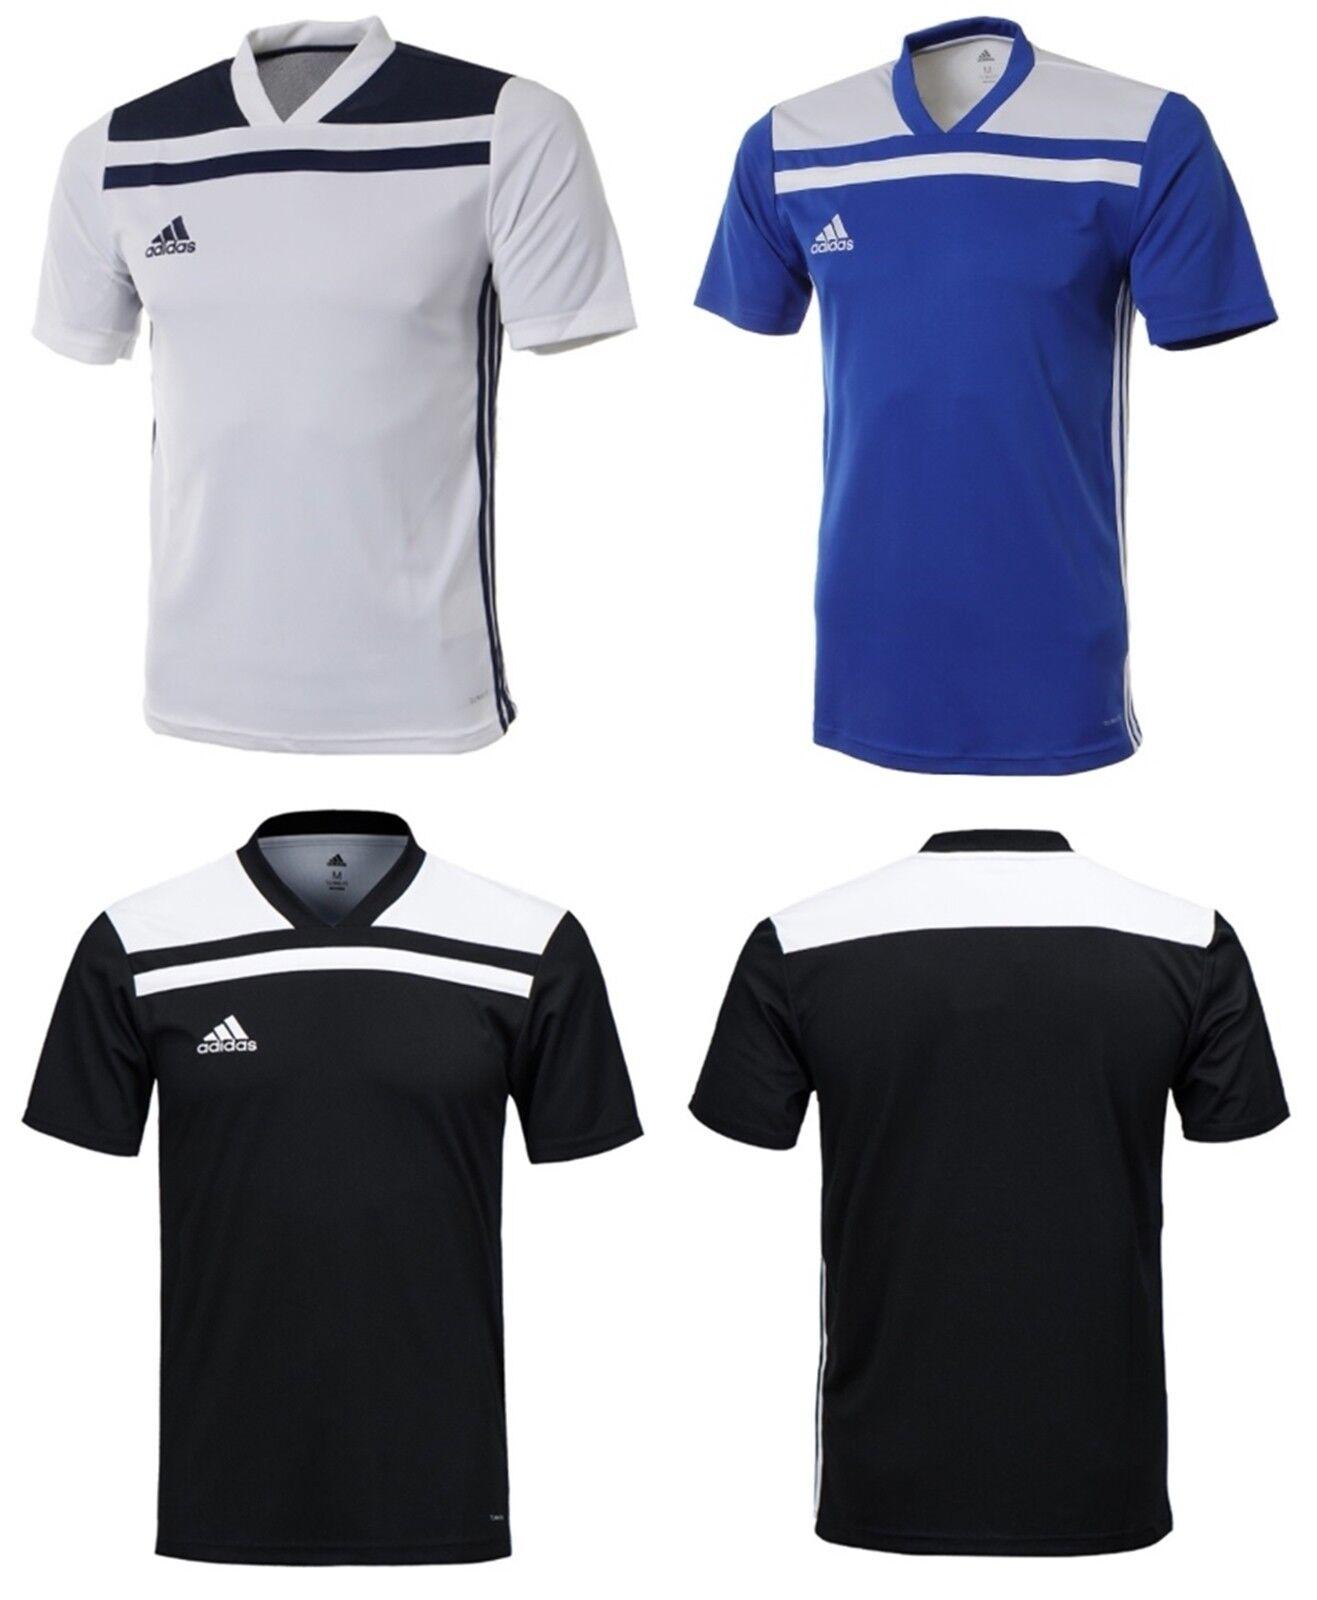 Adidas Youth Regista 18 Training Soccer Climalite Weiß Blau Schwarz Kinderhemden